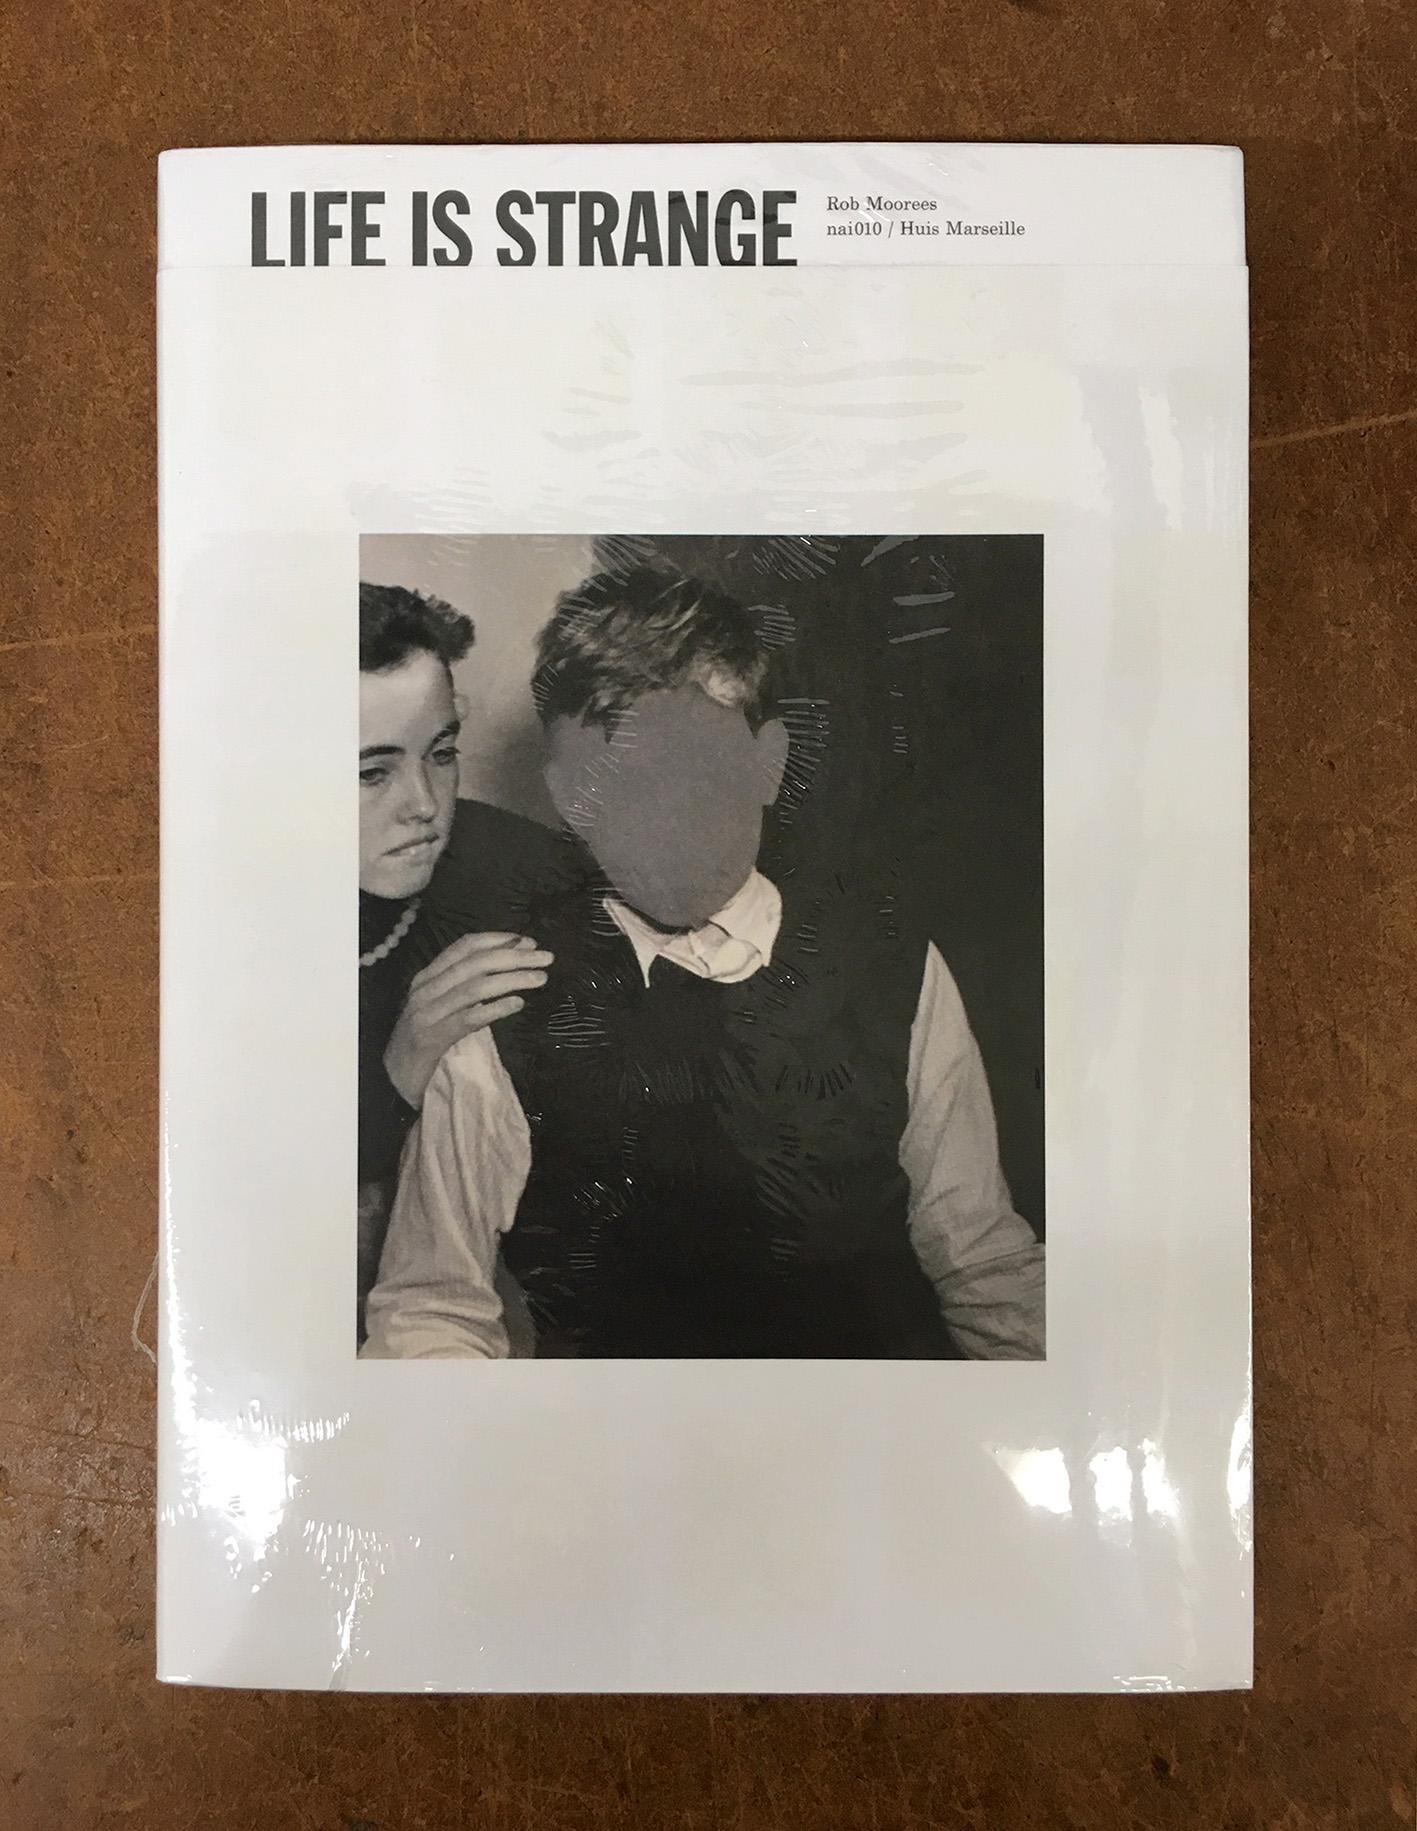 Life is strange  (Rob Morees, NAI010/Huis Marseille)